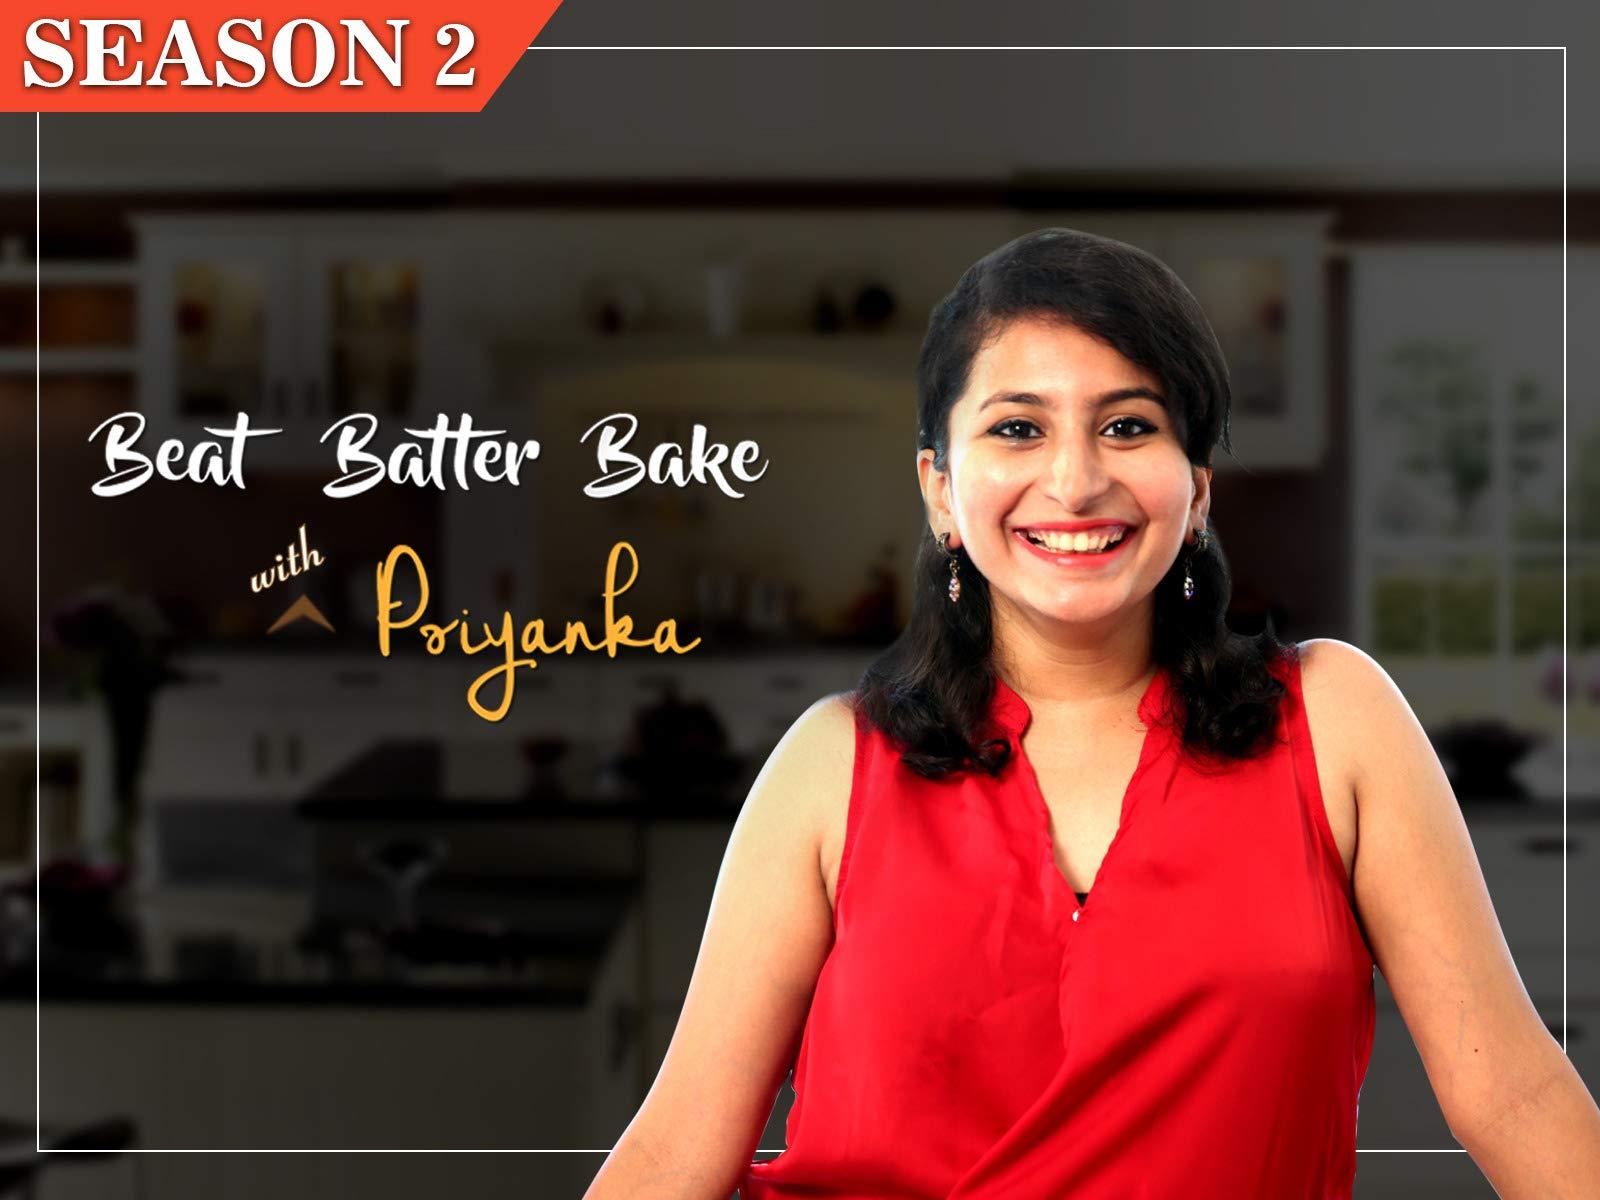 Clip: Beat Batter Bake With Priyanka - Season 2